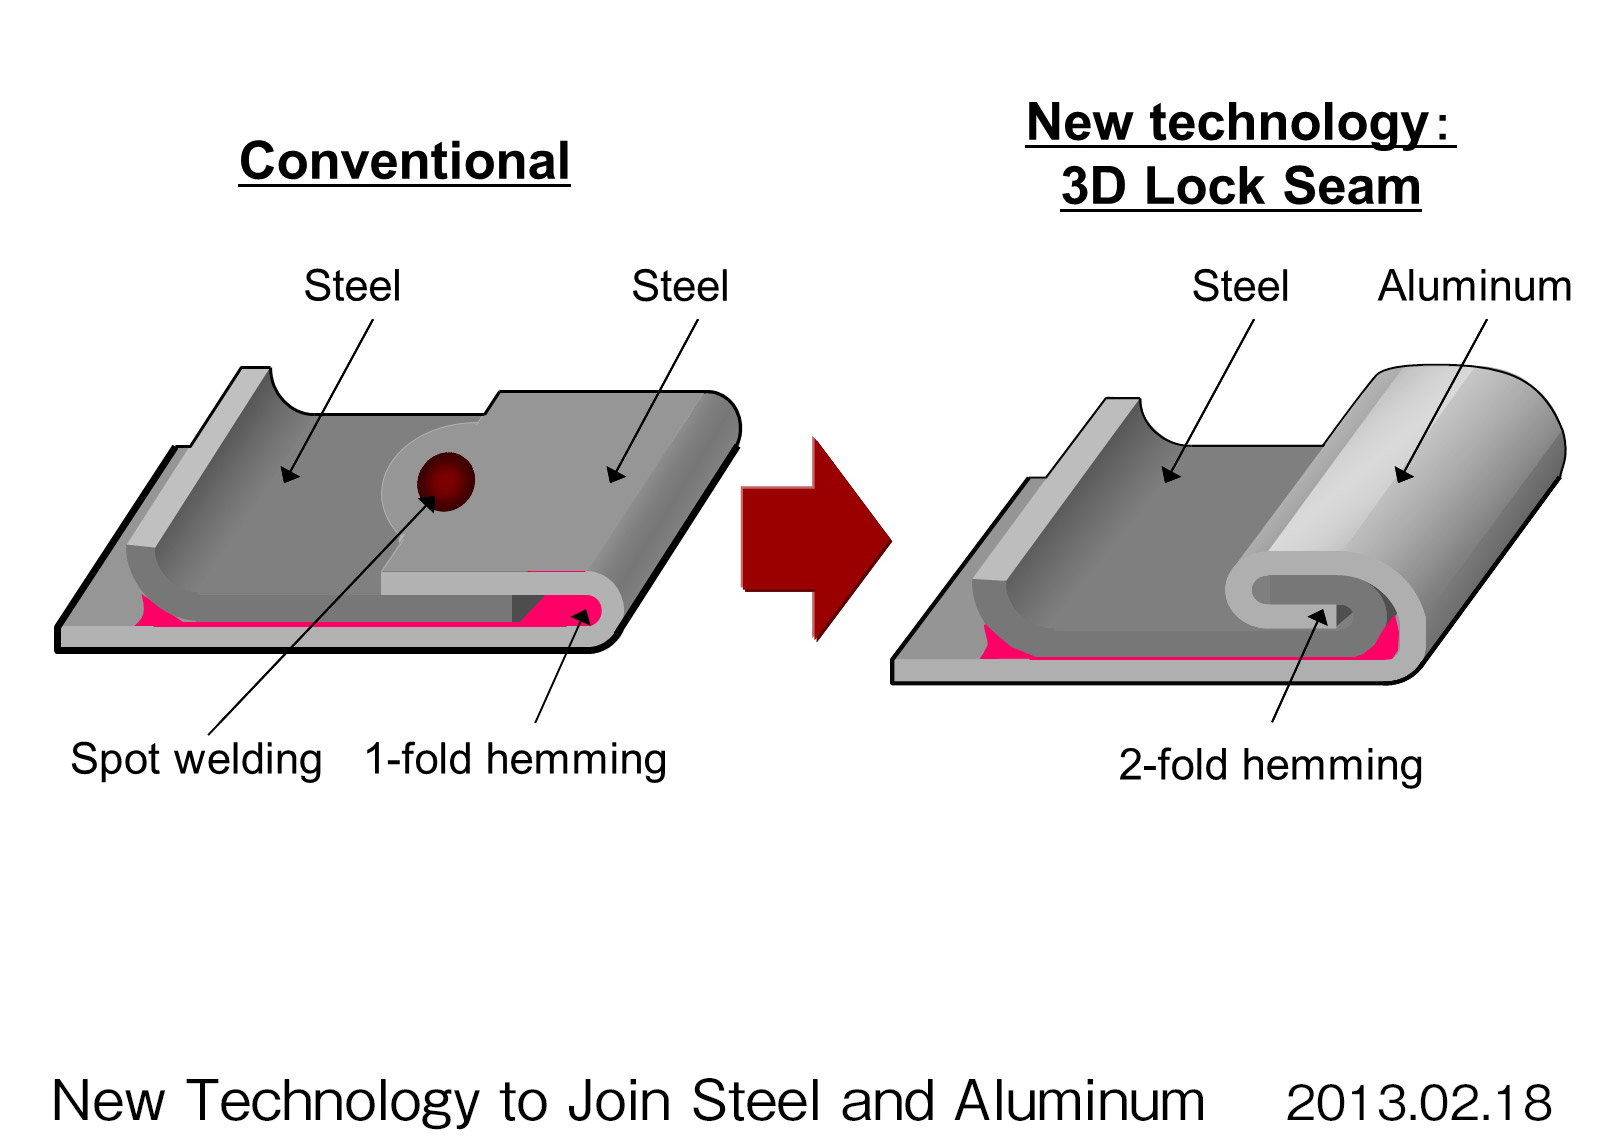 Welding Aluminum To Steel >> New Welding Technique Helps Acura Integrate More Aluminum In Its Cars